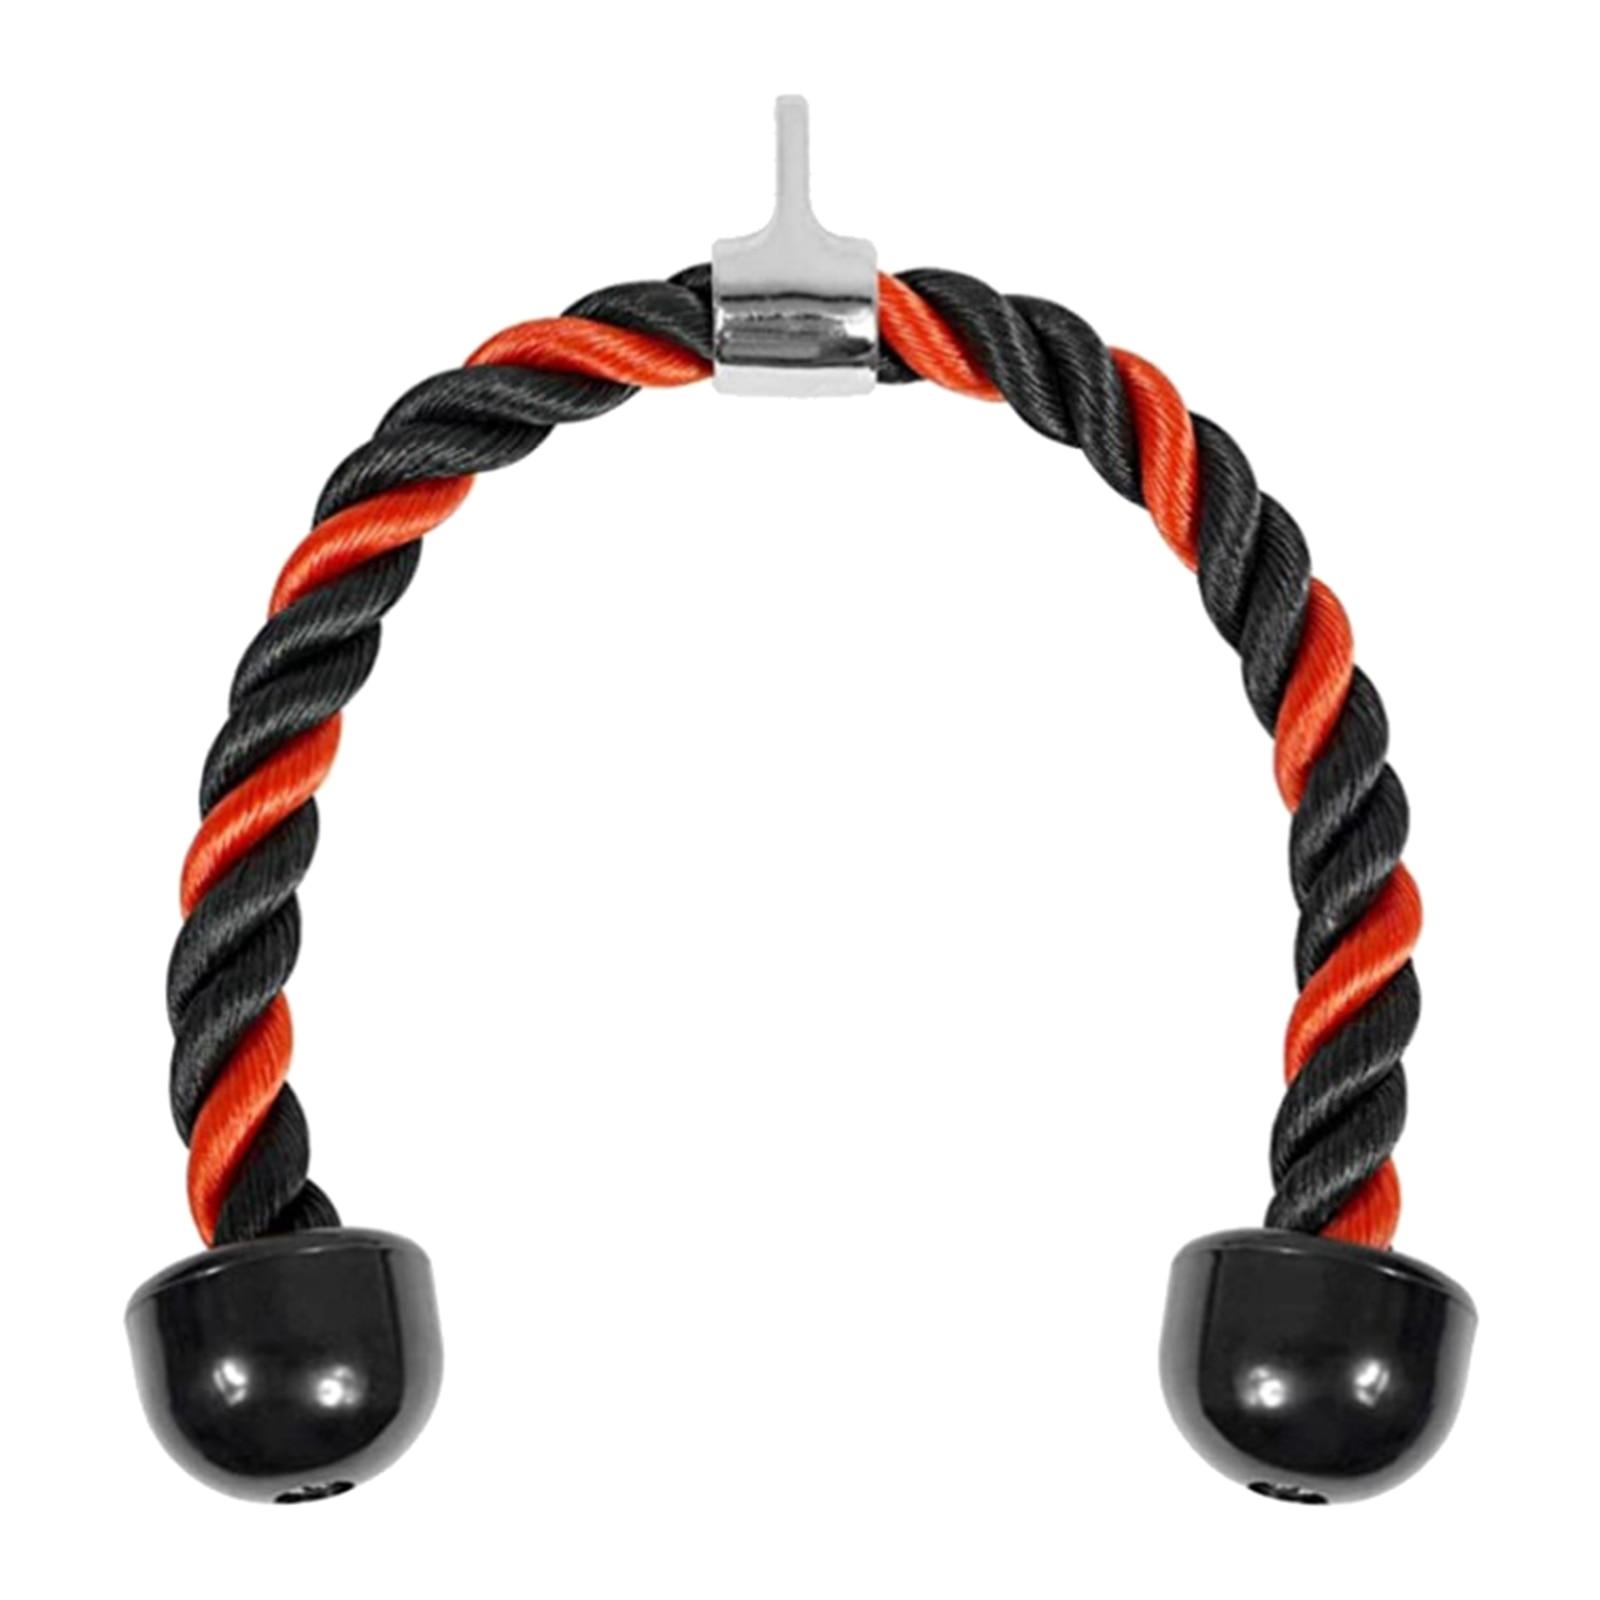 Lat Bicep-cuerdas para tríceps, accesorio de Cable con mango extraíble con 2...